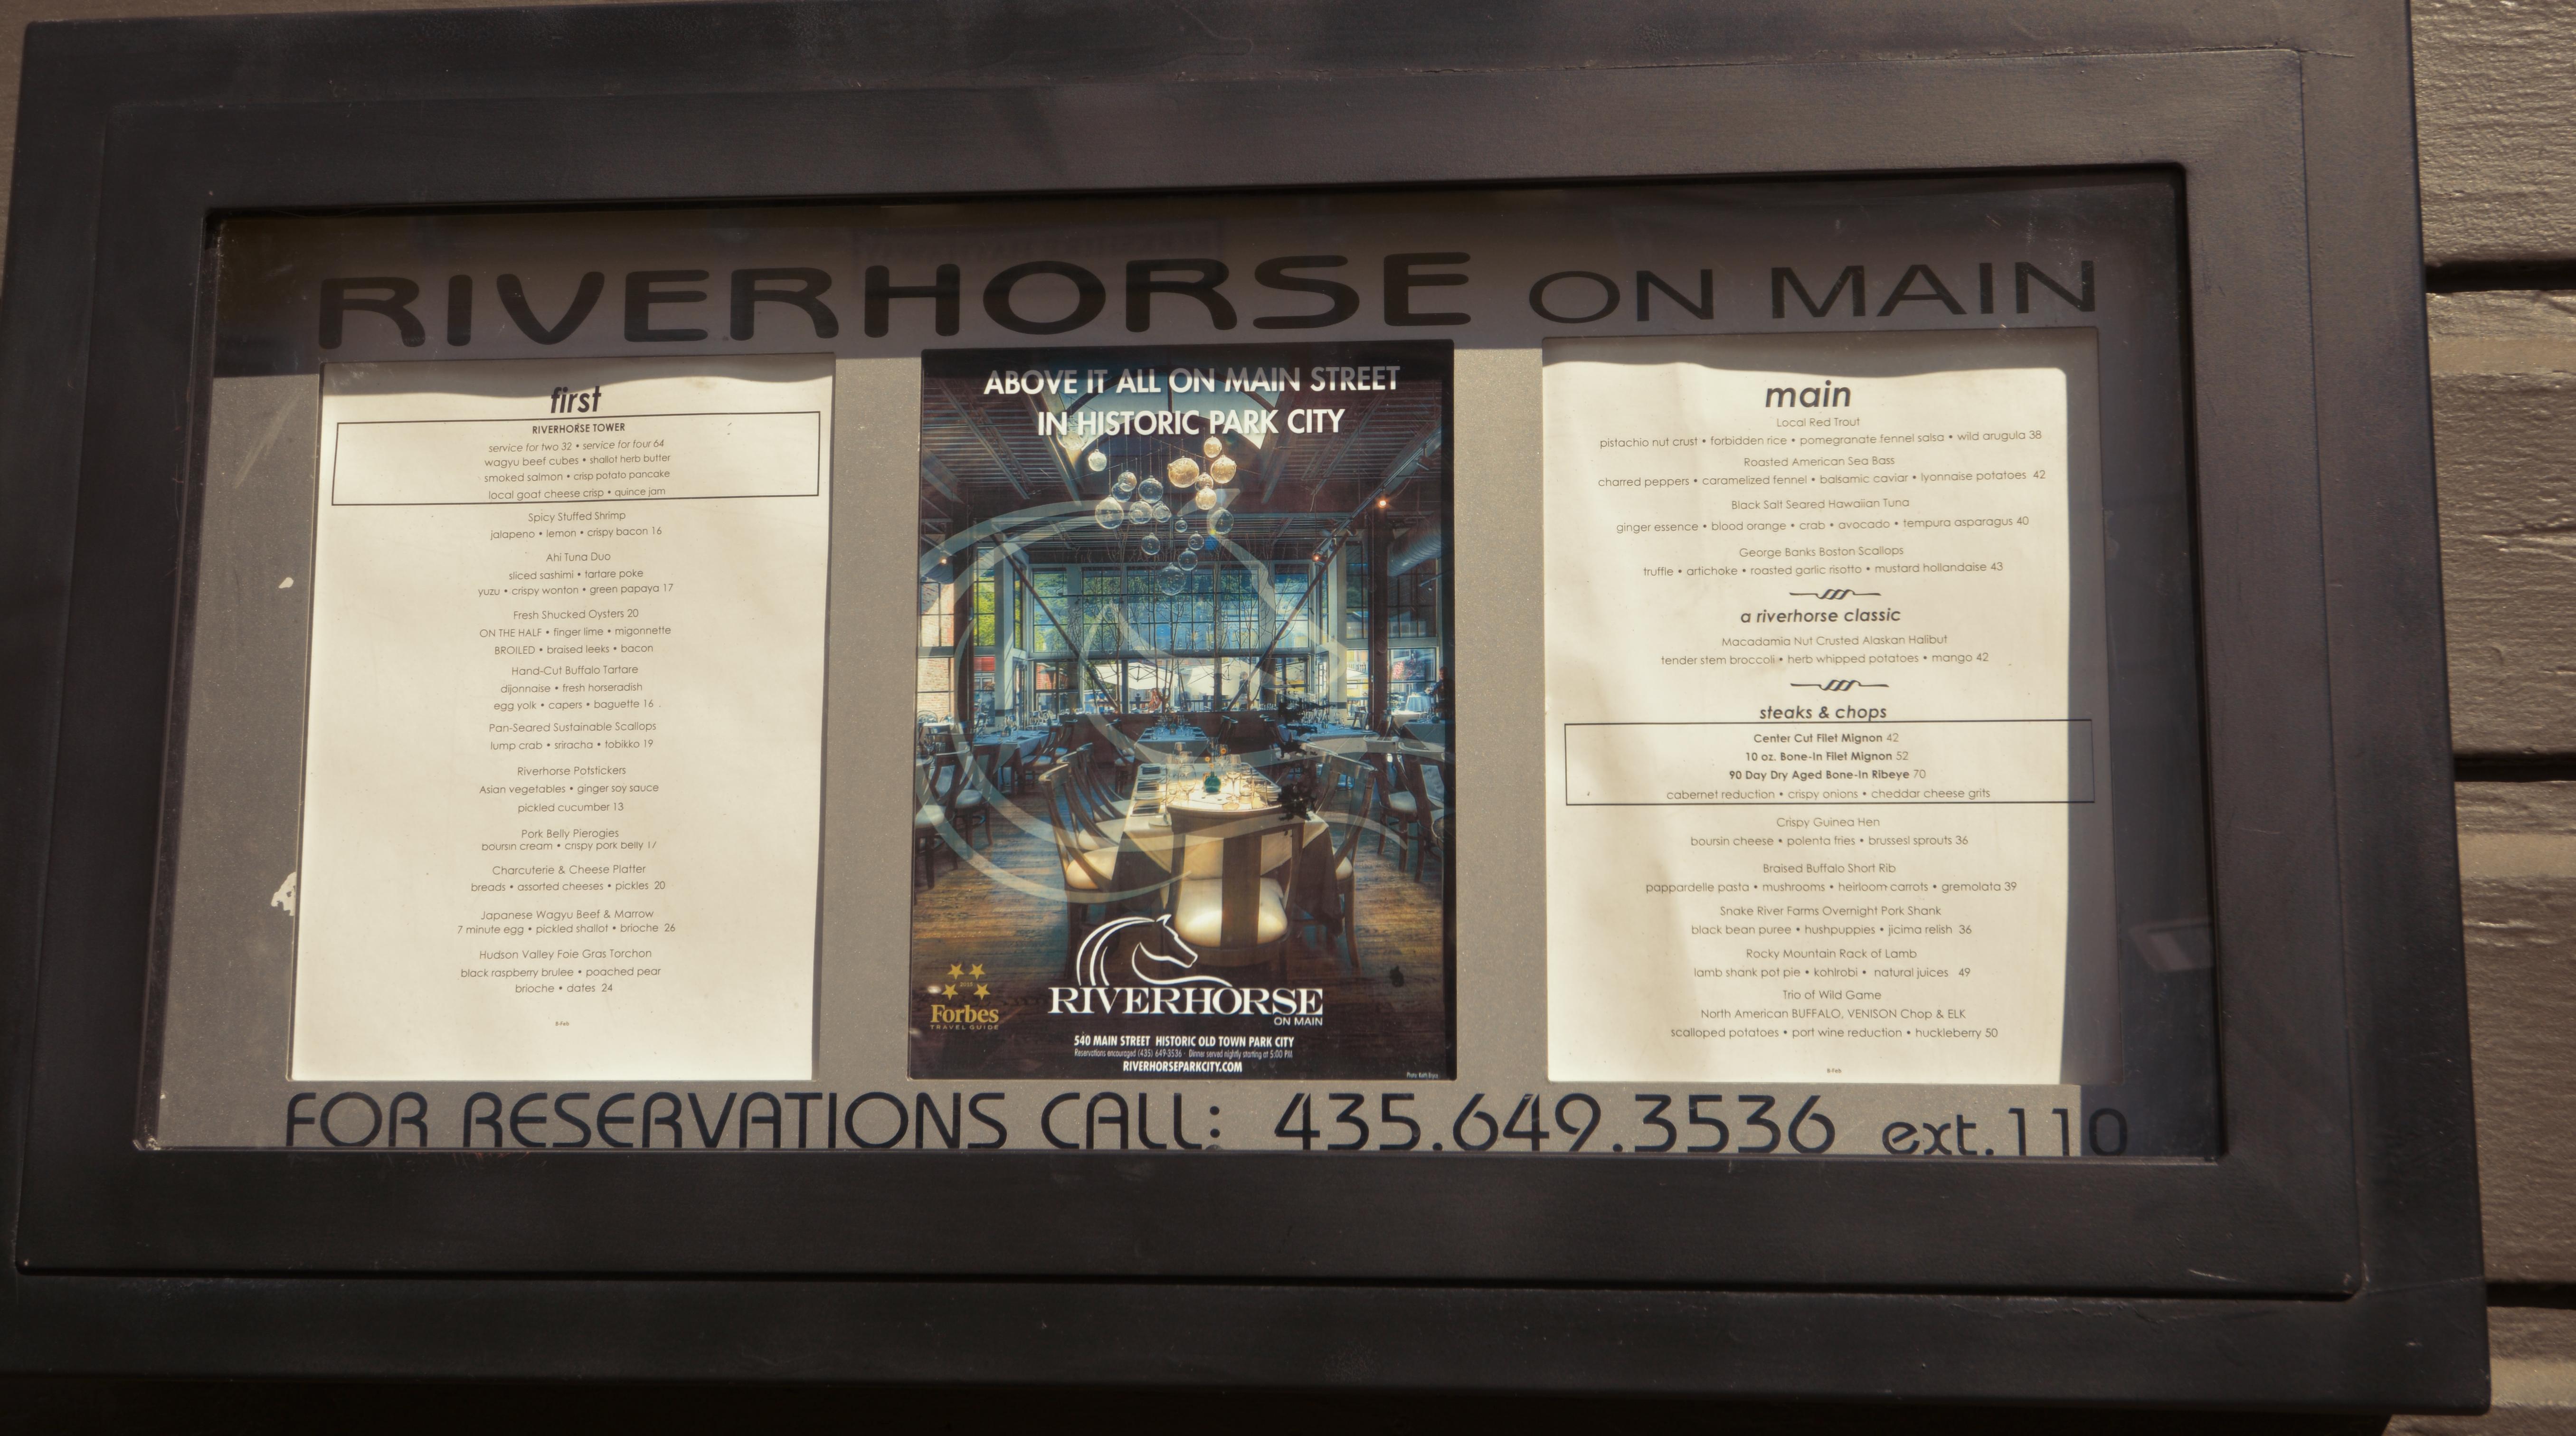 FOTS-Restaurants on Main Street